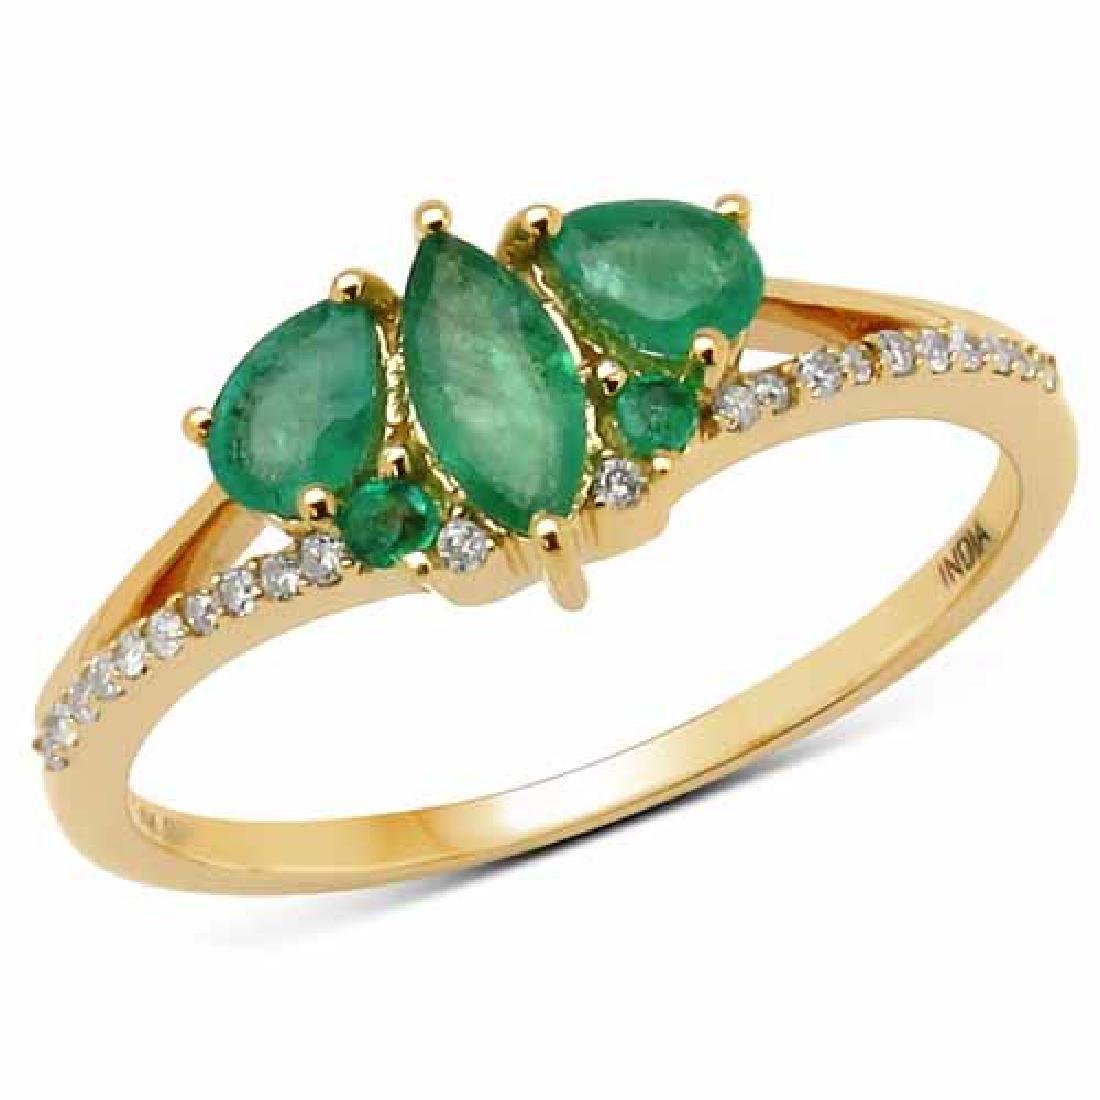 0.64 Carat Genuine Zambian Emerald and White Diamond 14